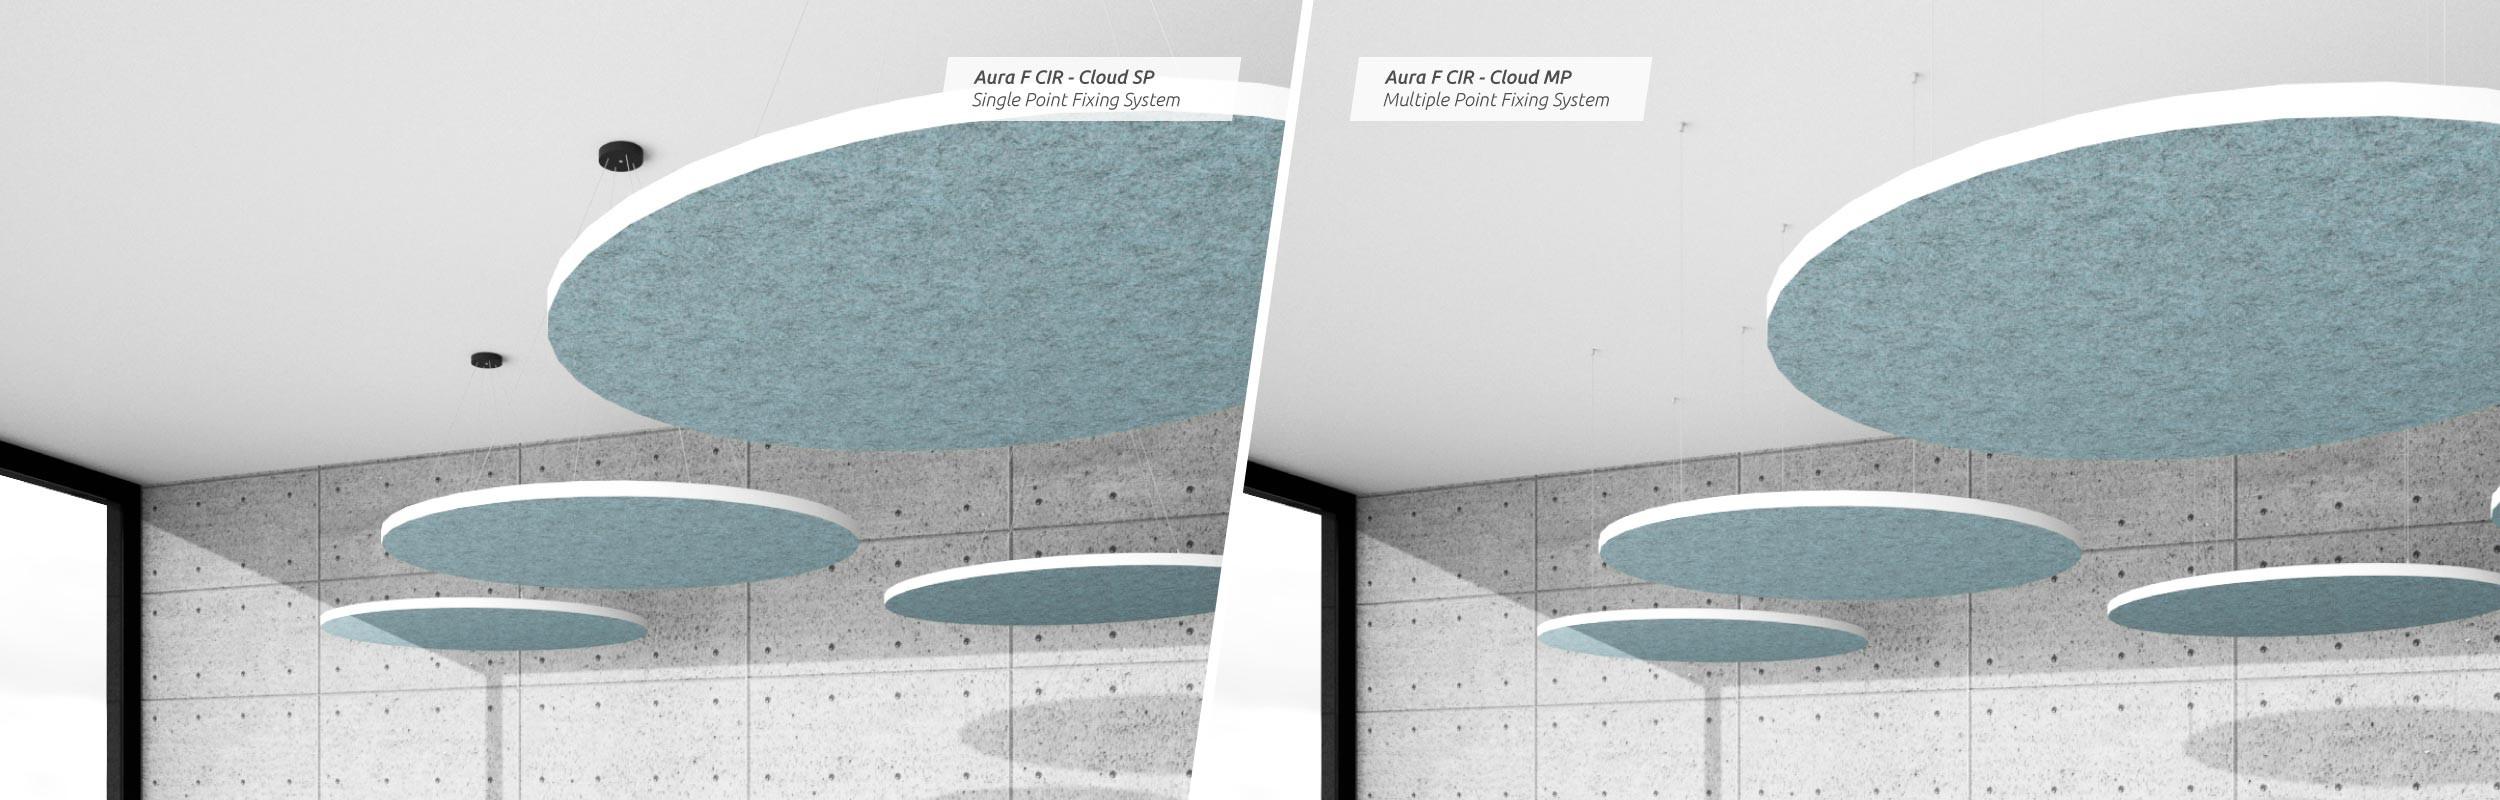 artnovion-product-aura-f-cir-cloud-range